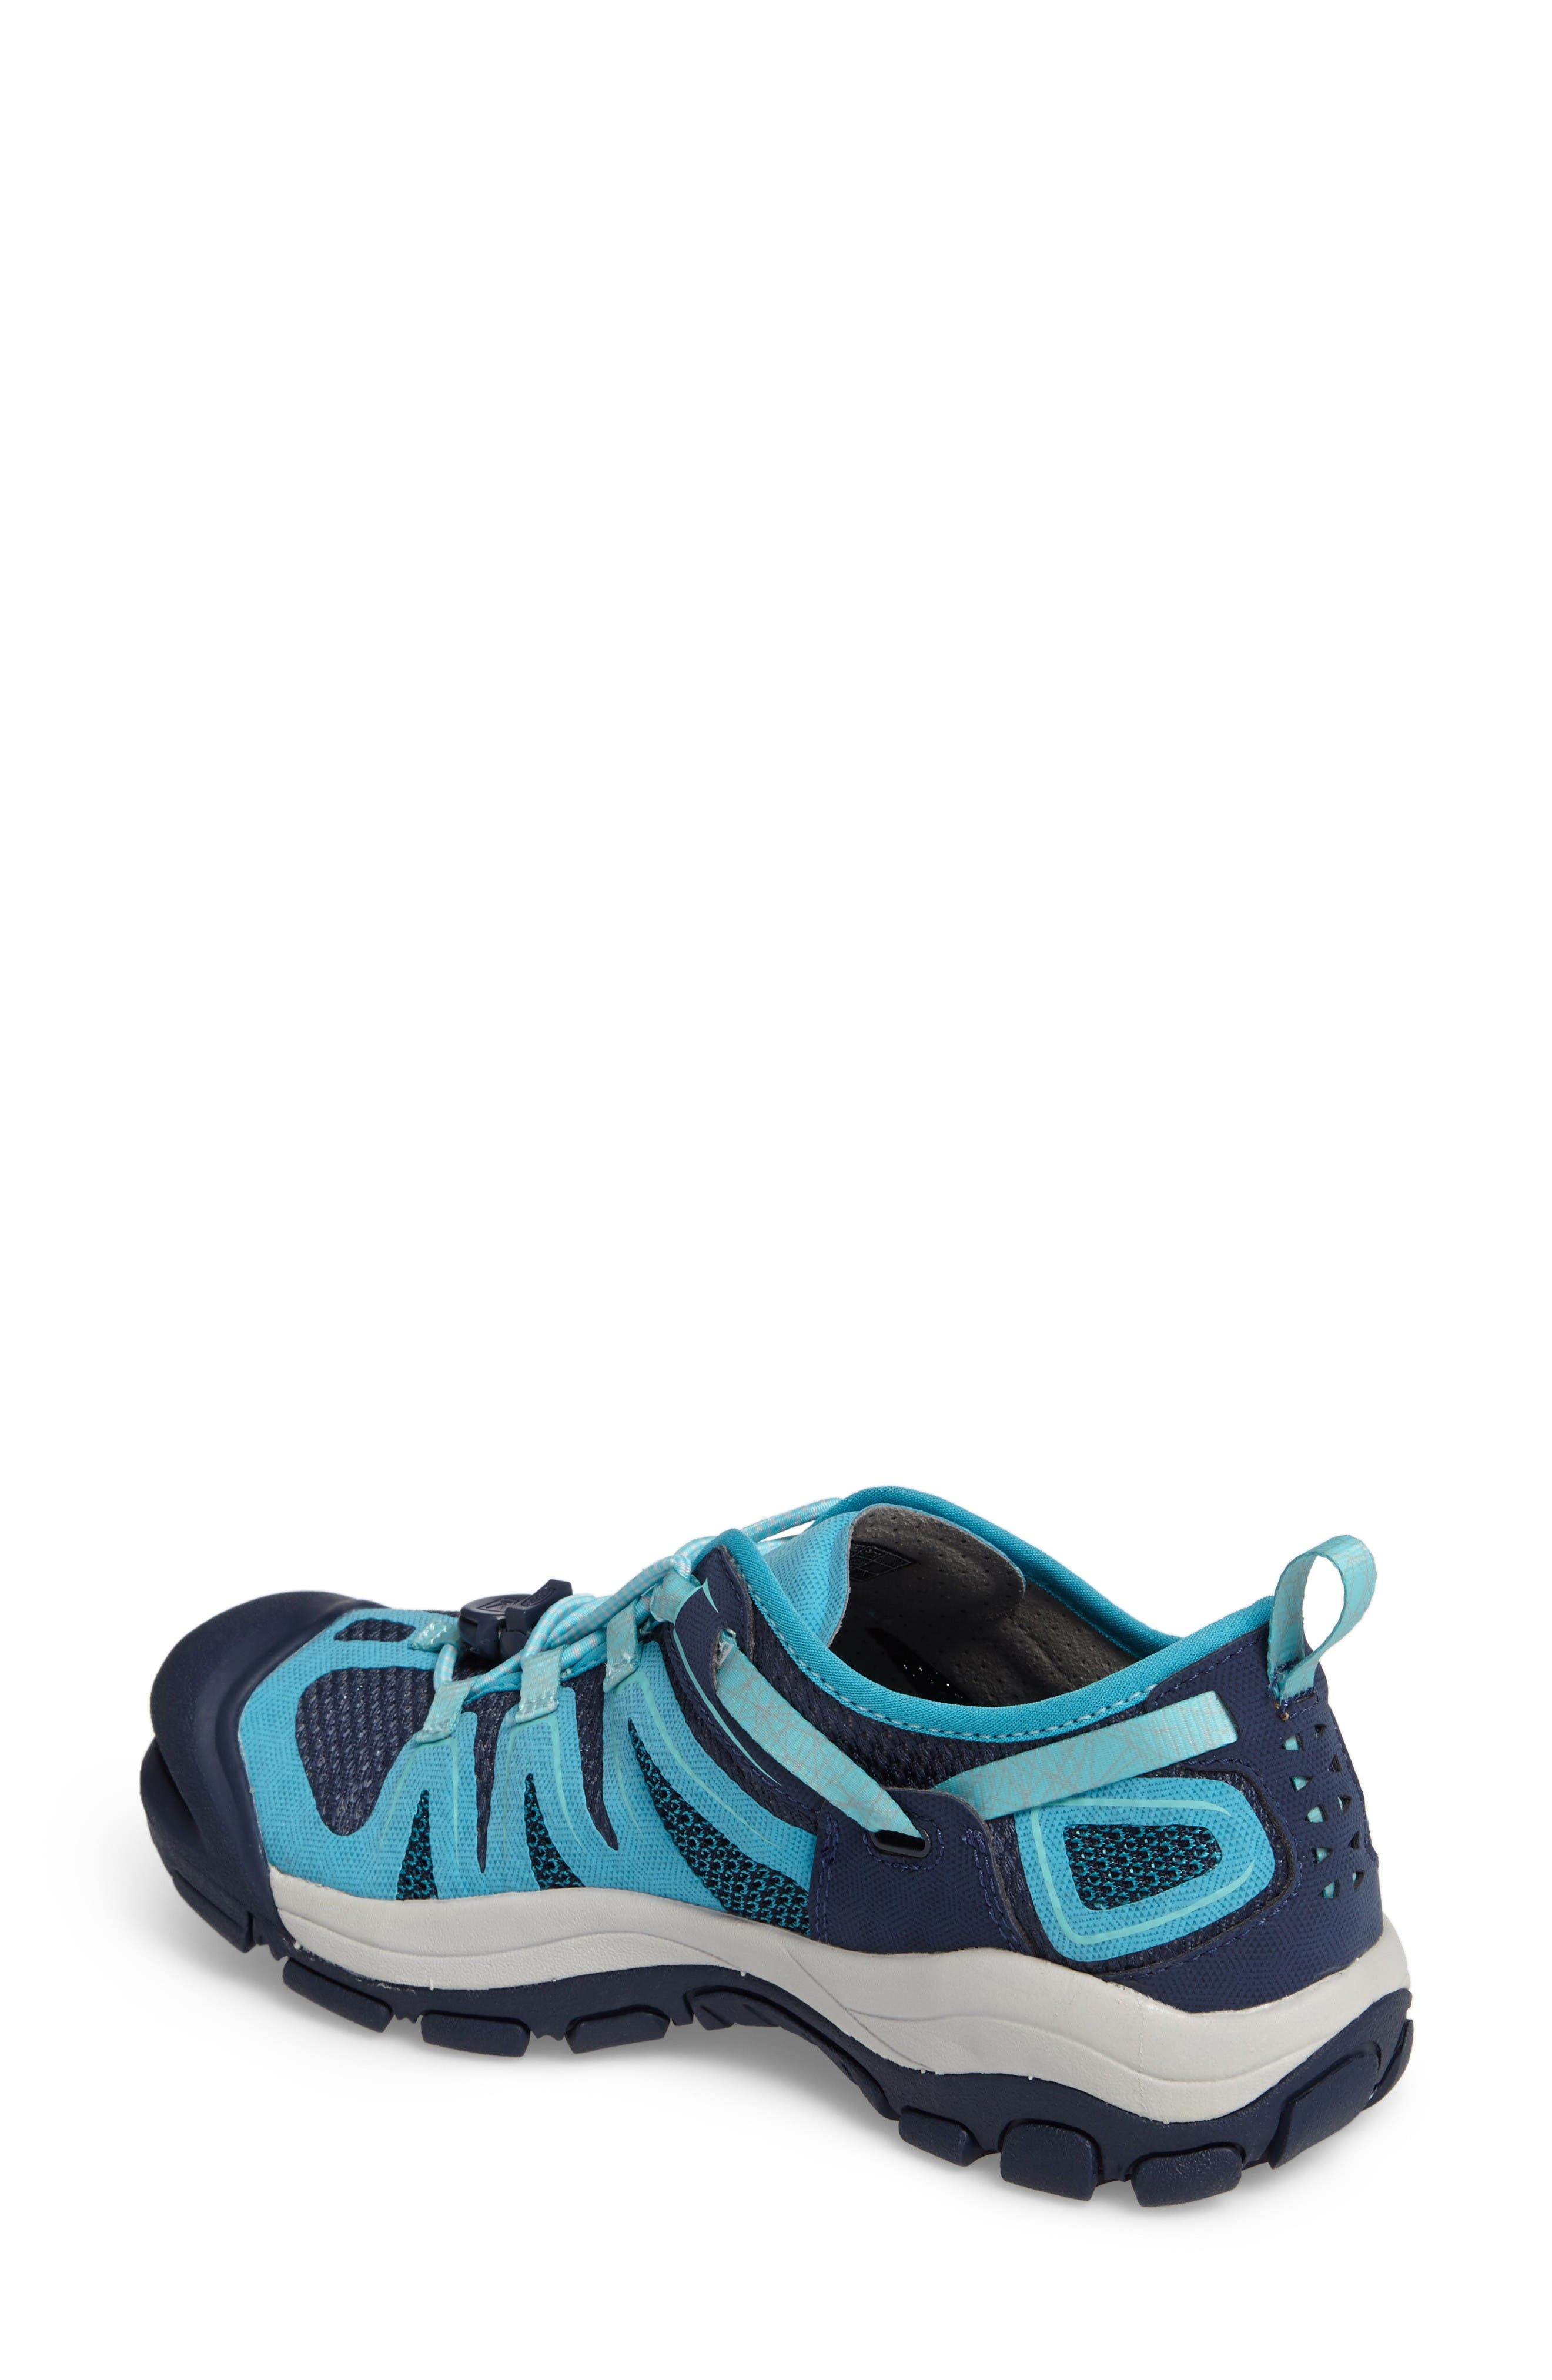 McKenzie II Waterproof Sneaker,                             Alternate thumbnail 2, color,                             Dress Blues/ Algiers Fabric